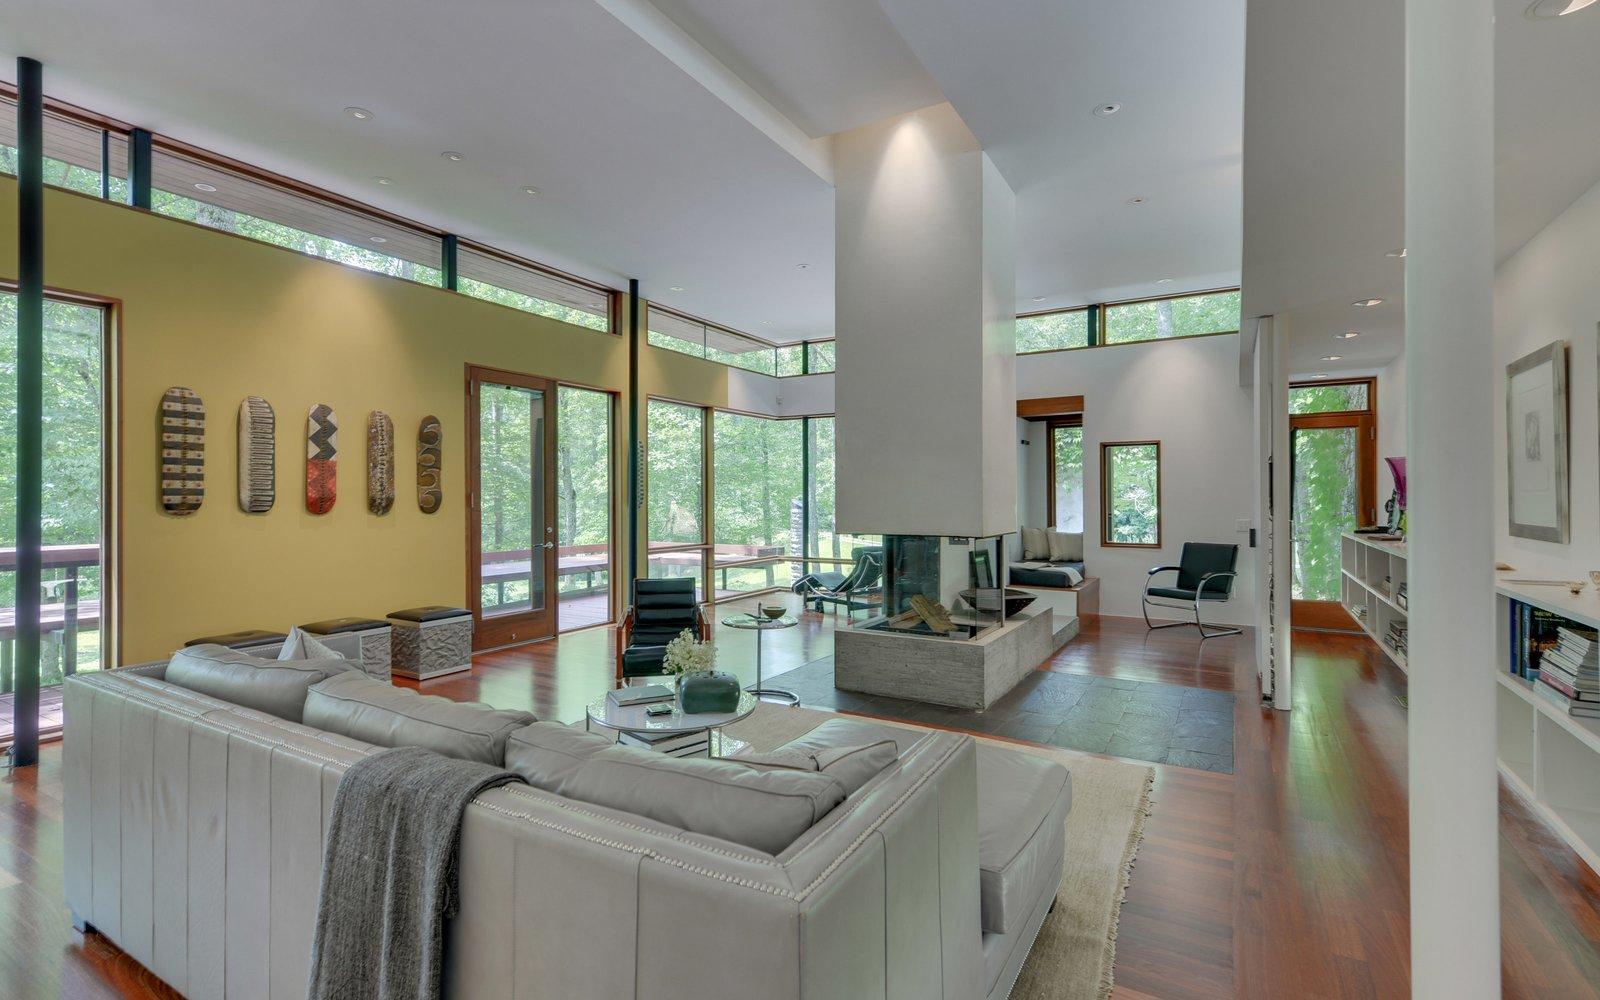 U0027Mountain Houseu0027   Living Room Tagged: Medium Hardwood Floor, Two Sided